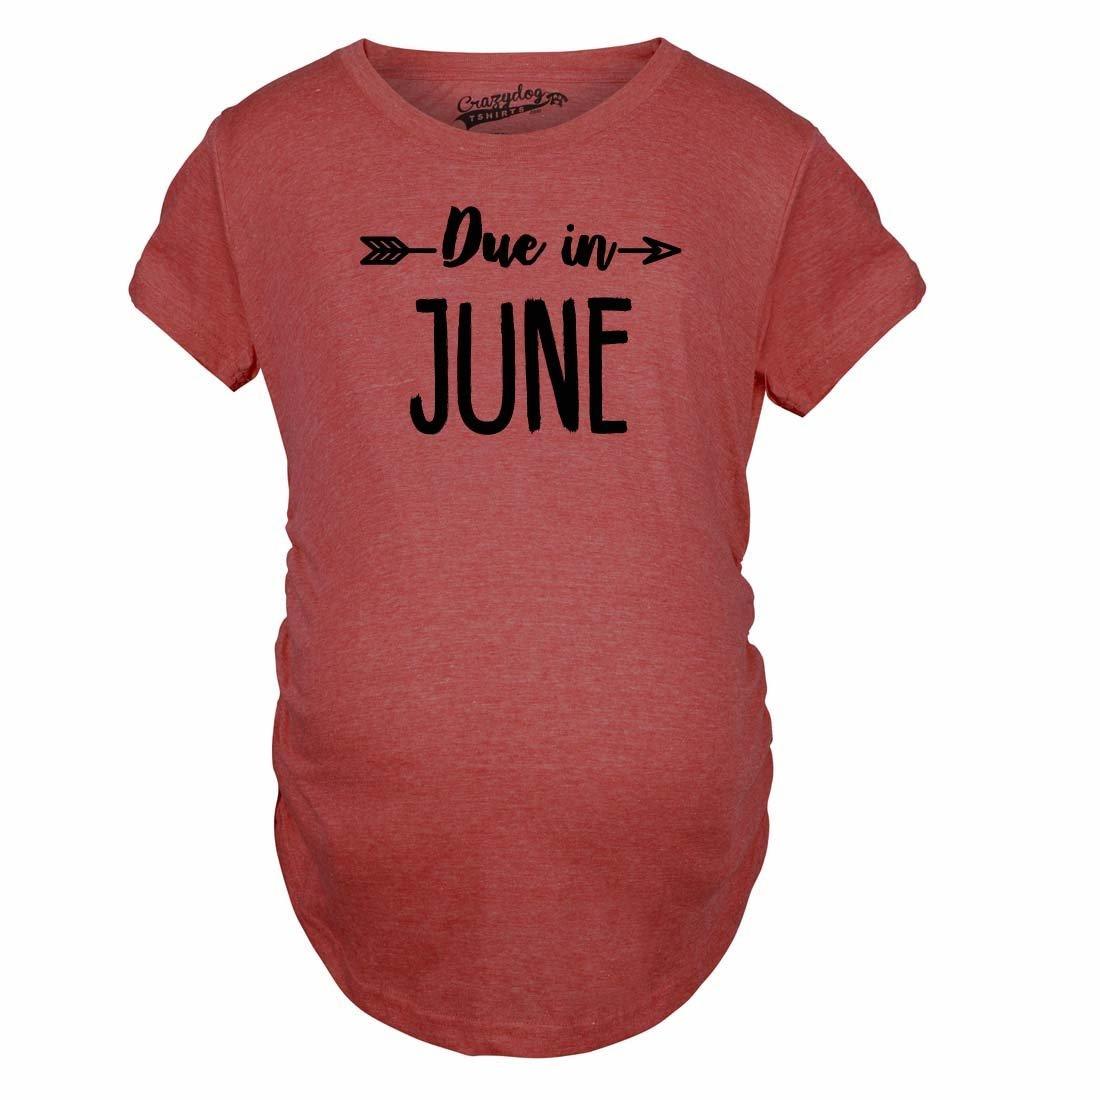 Maternity Due In June Tshirt Baby Shower Announcement Pregnancy Tee Crazy Dog Tshirts 018DueInJuneMAT